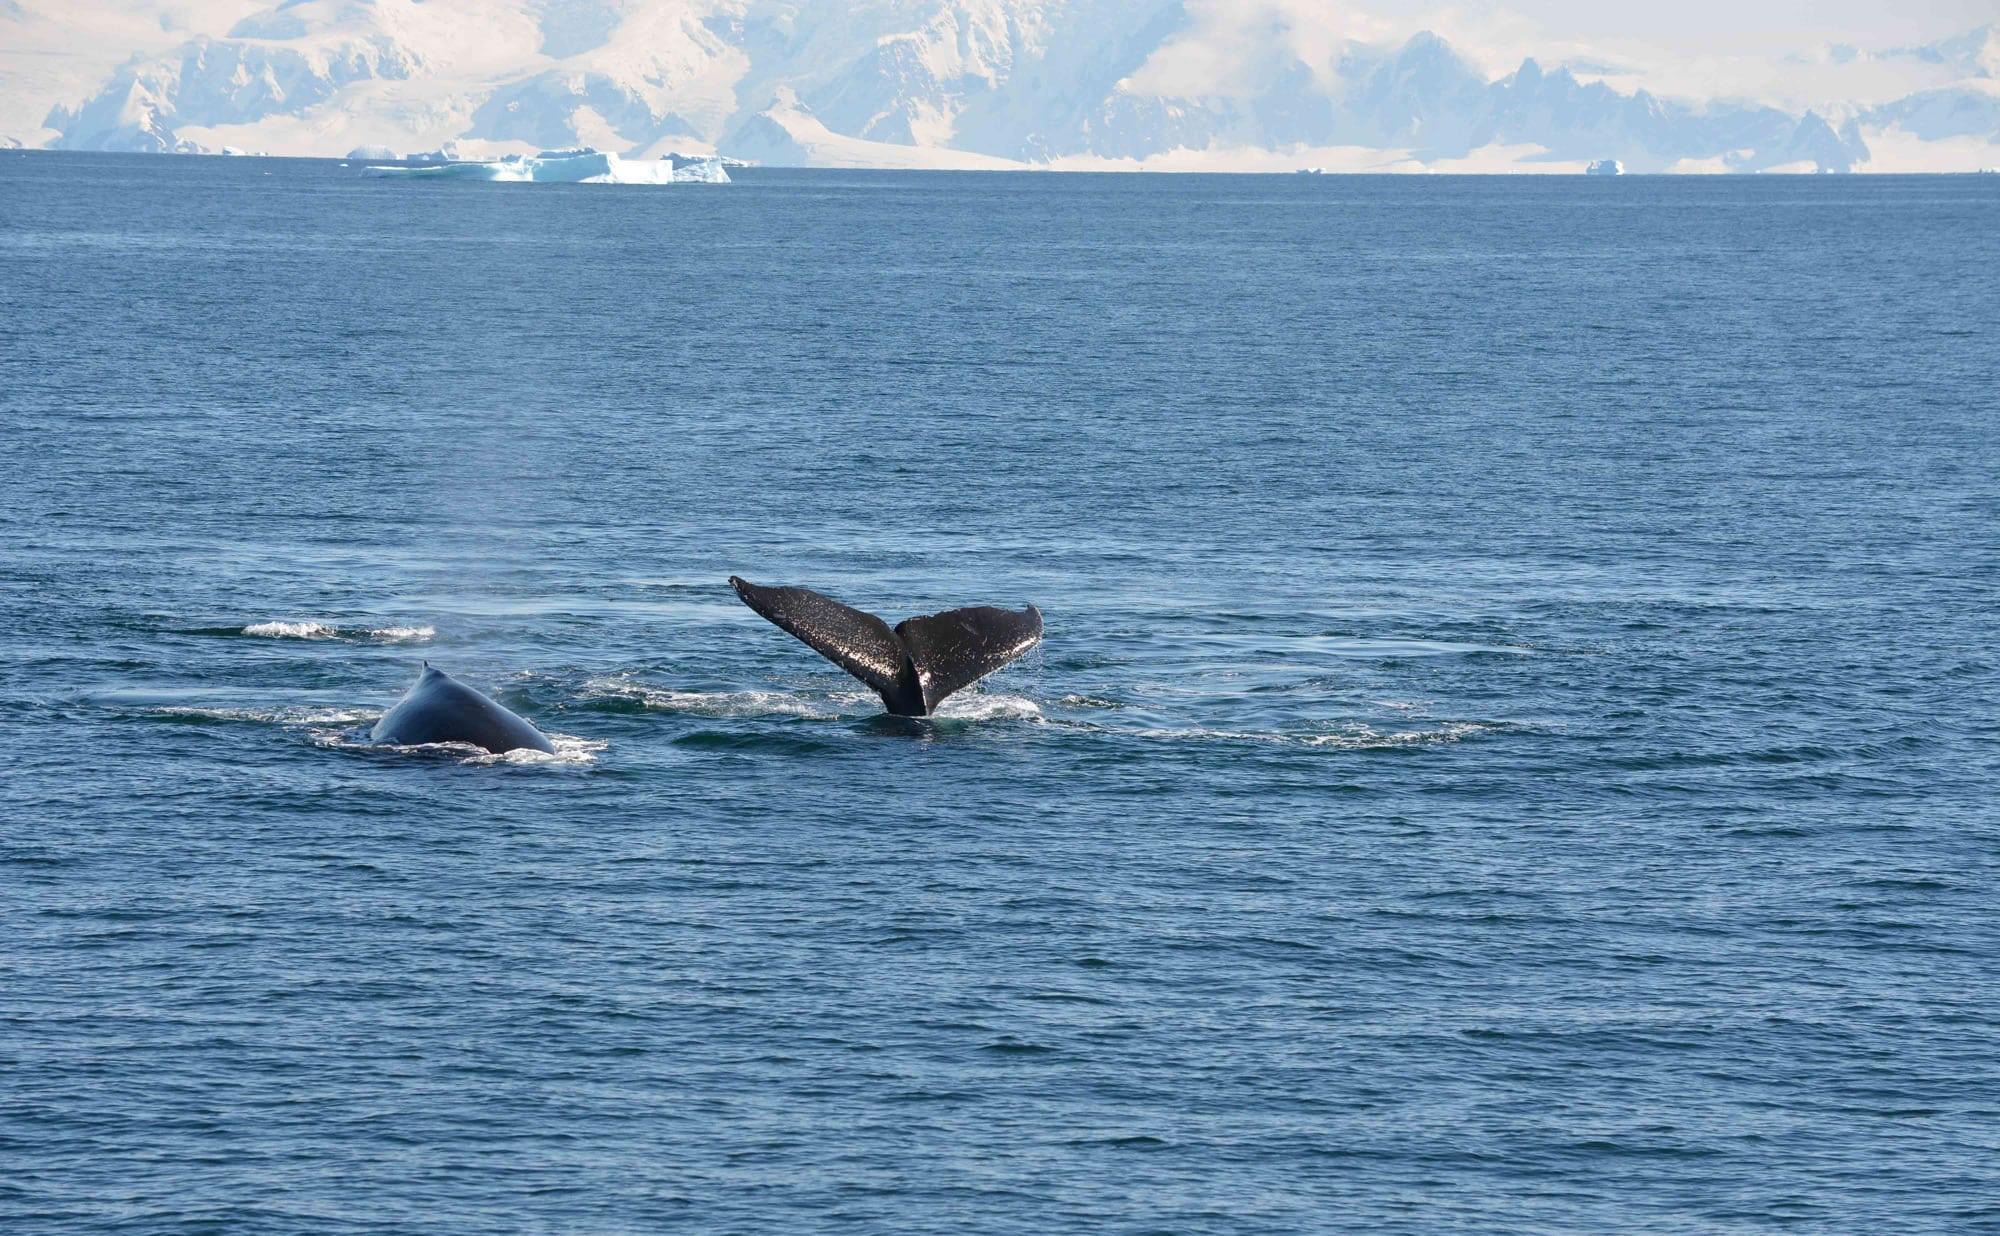 Buckelwale in der Antarktis. (C) Marta Hevia / WDC